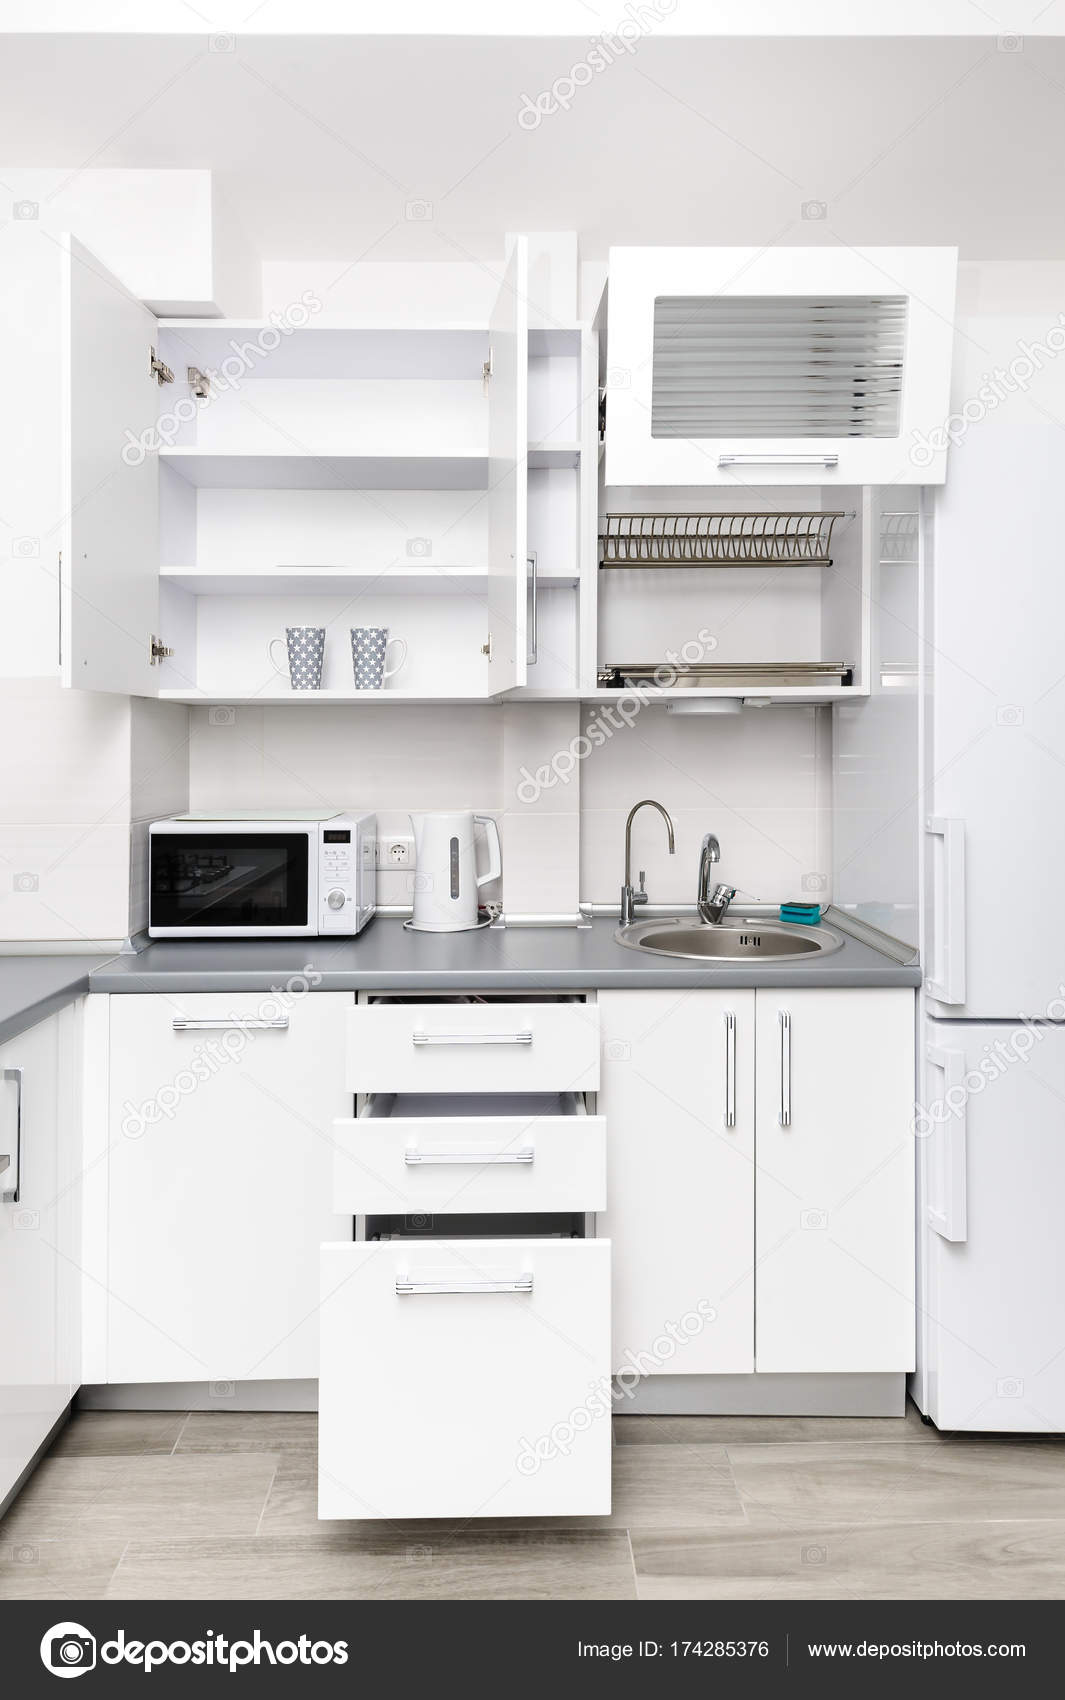 Cocina Moderna Blanca Foto De Stock C Starush 174285376 - Cocina-blanca-moderna